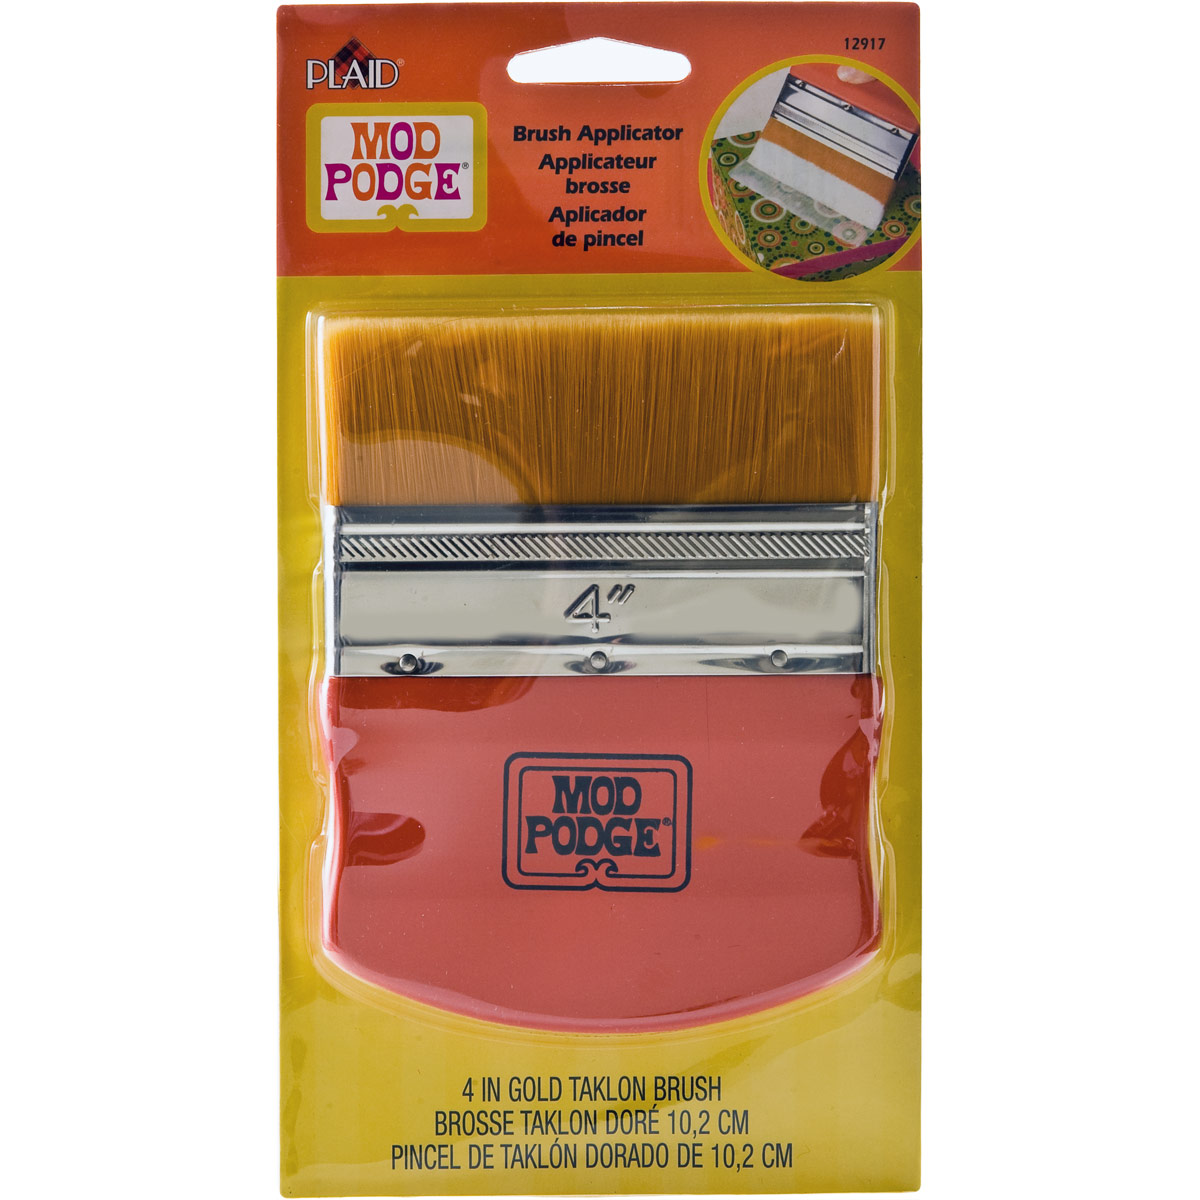 Mod Podge ® Brush Applicator, 4